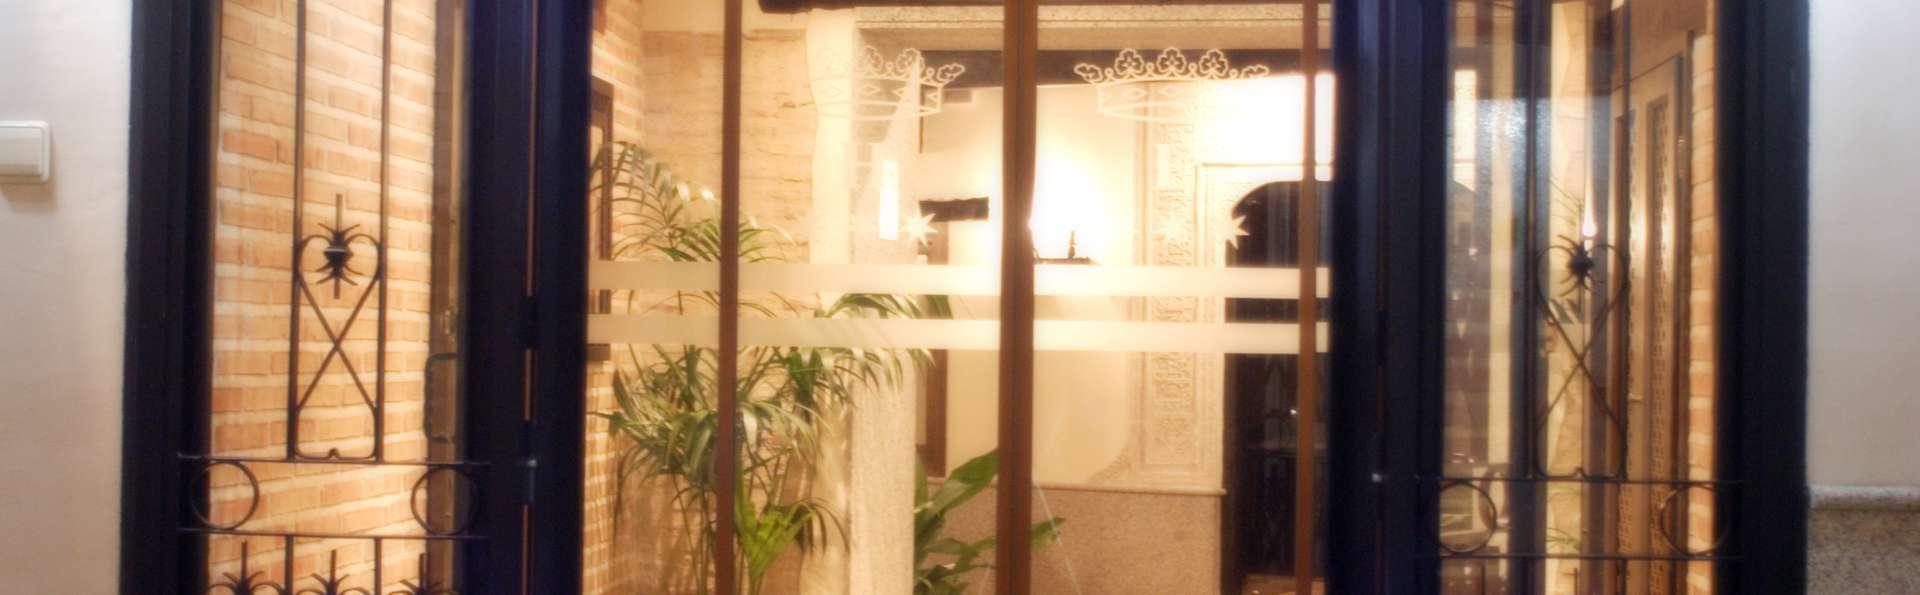 Hotel Eurico - 05.jpg